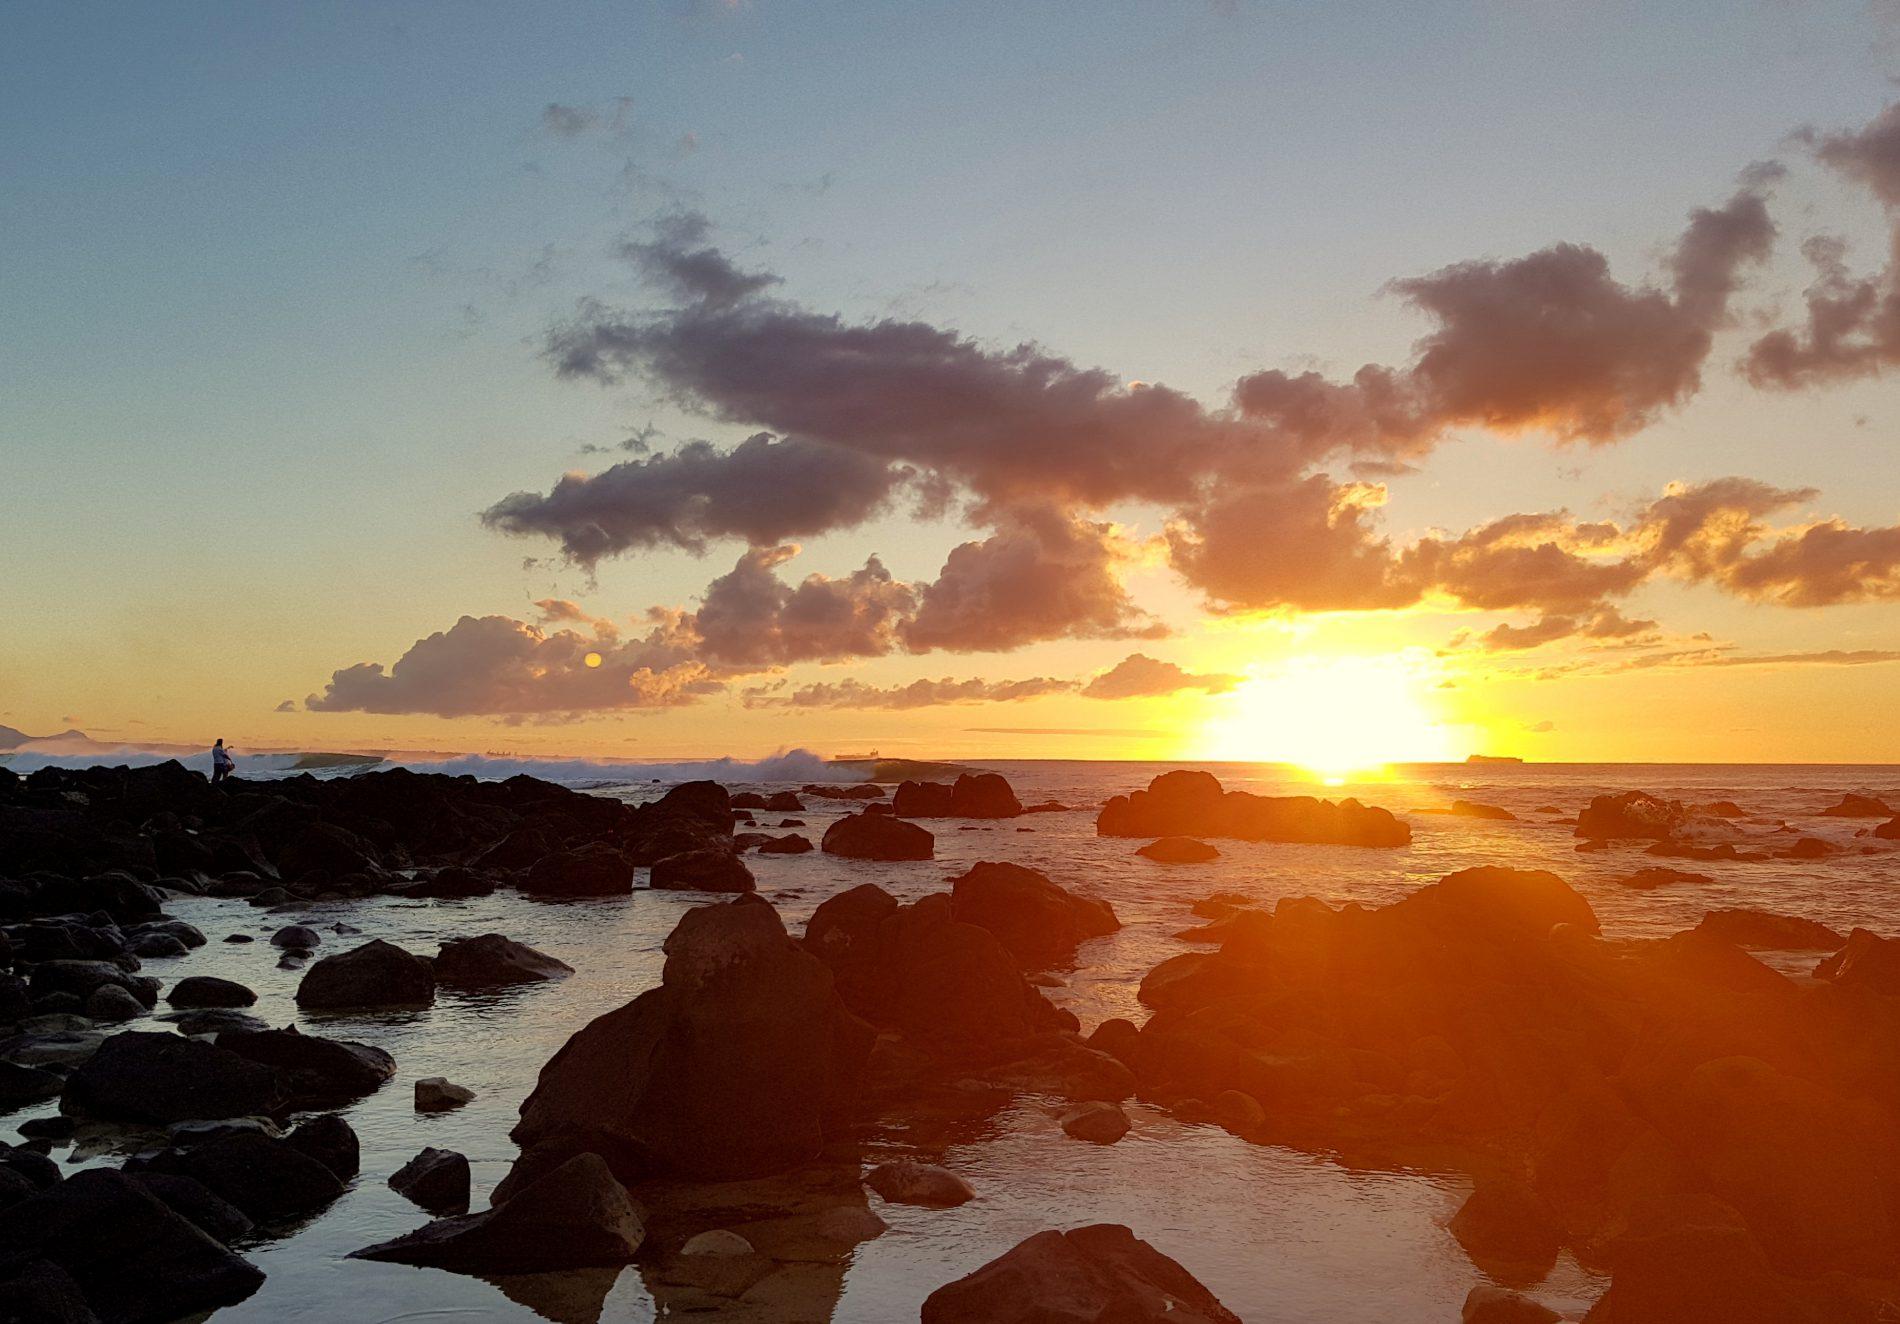 Egzotyka i piękno Mauritiusu